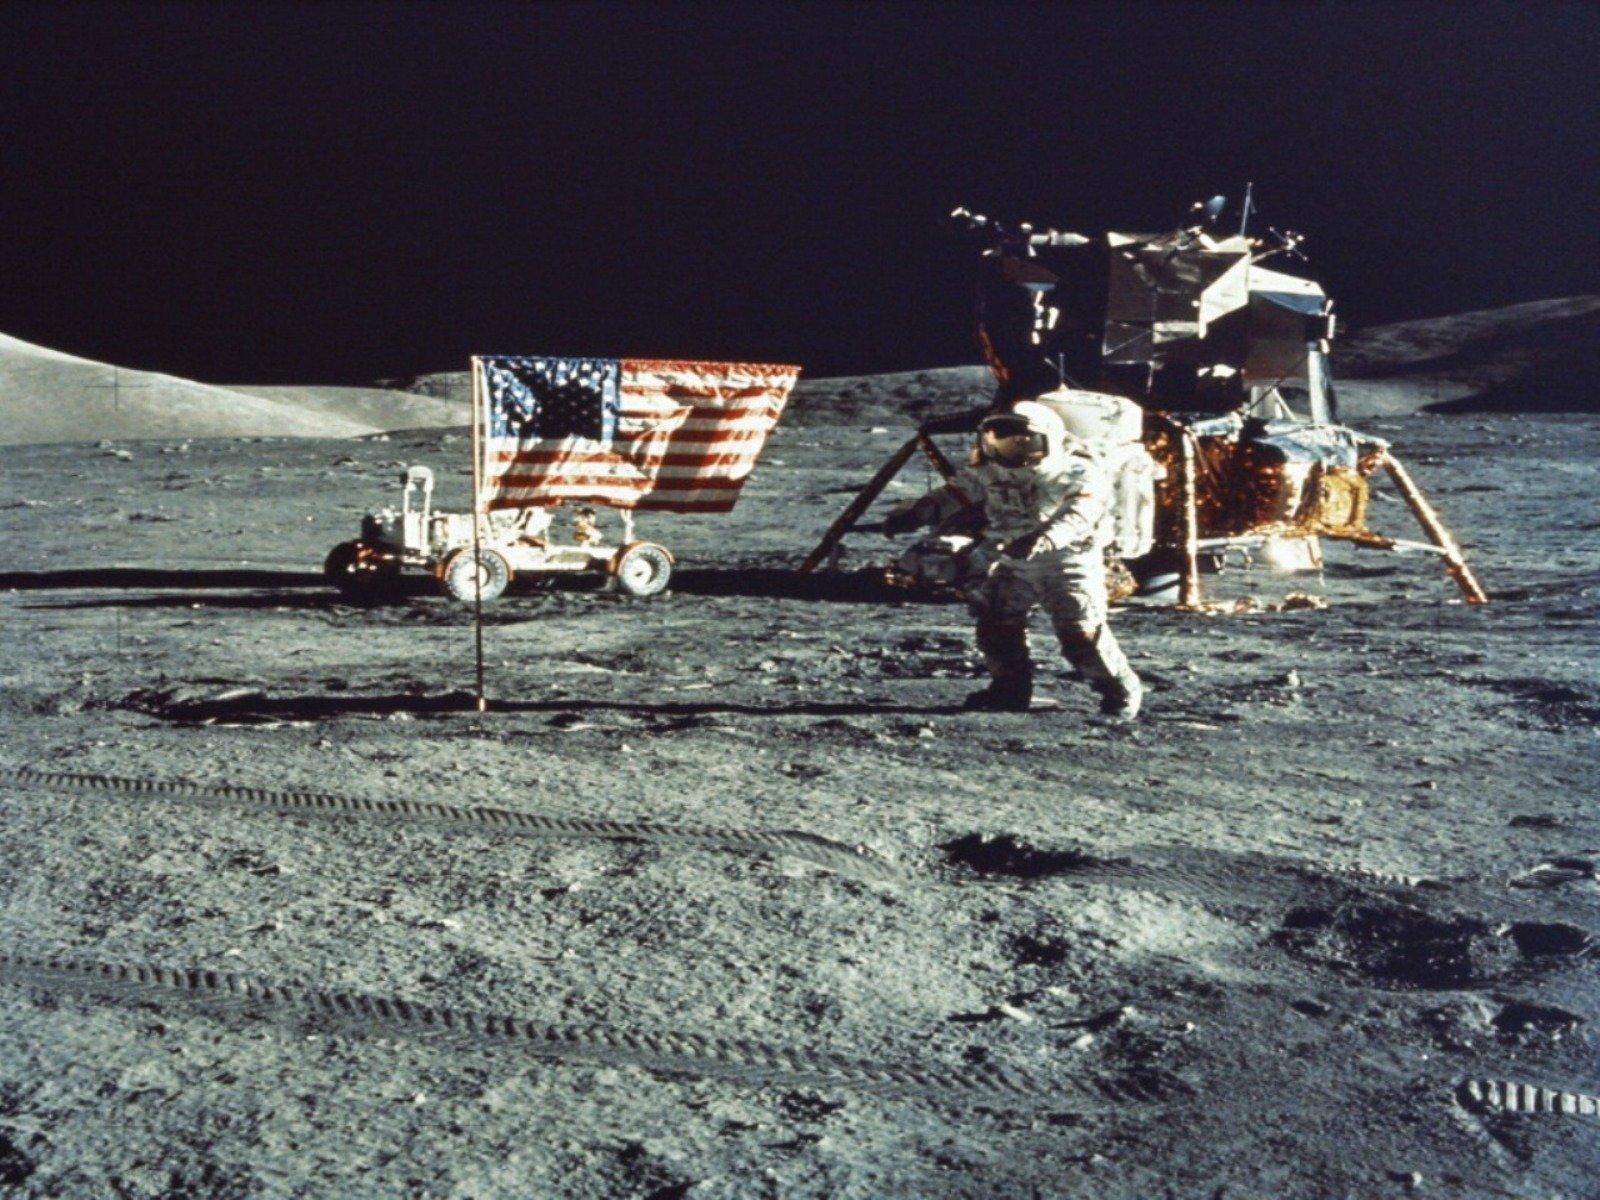 moon astronaut man nasa america mission apollo wallpaper background 1600x1200